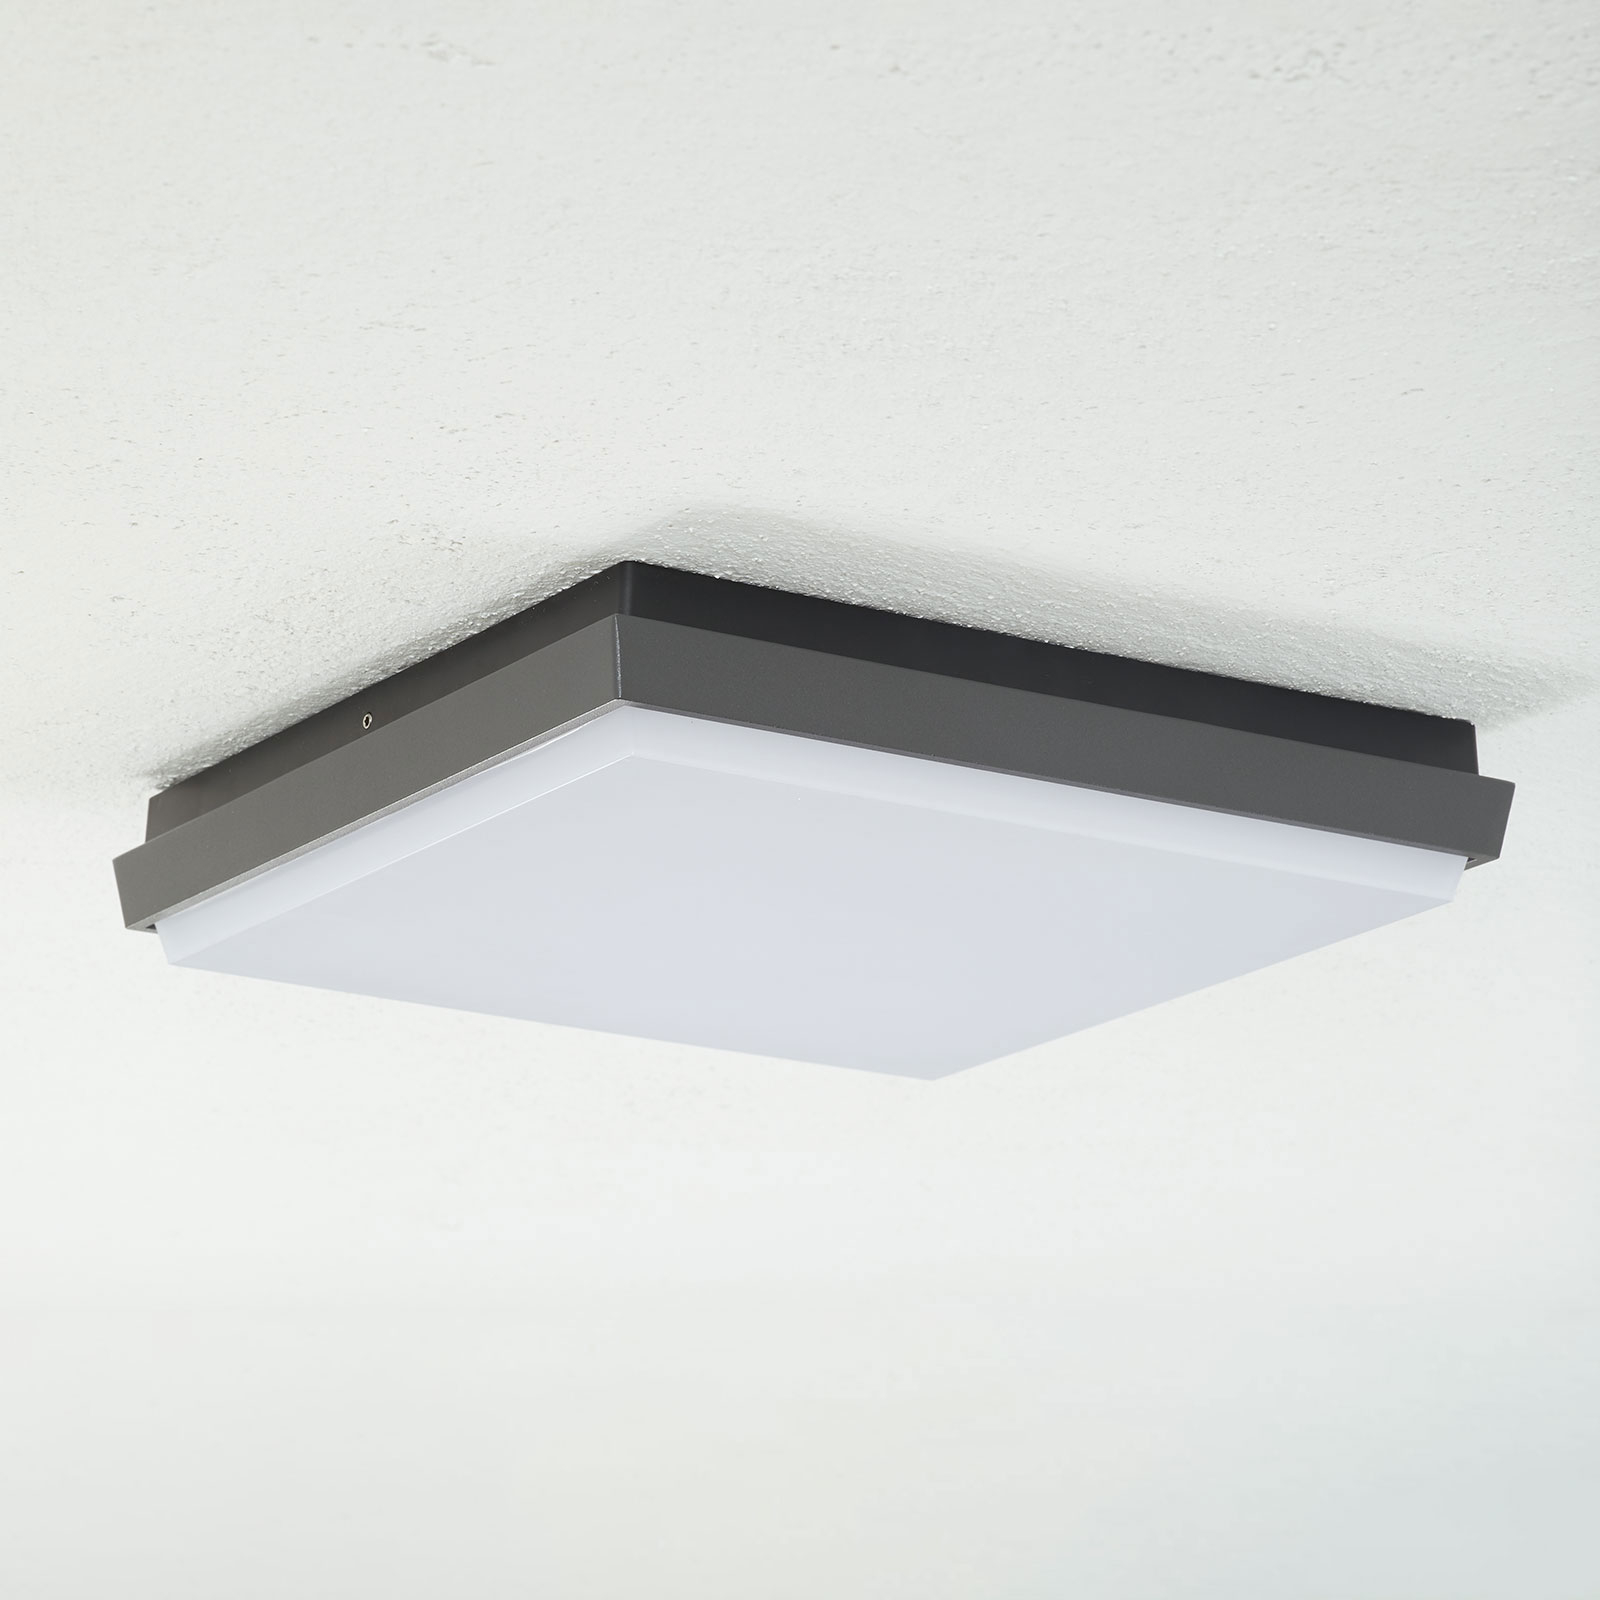 Lucande Amra plafonnier LED angulaire 30cm